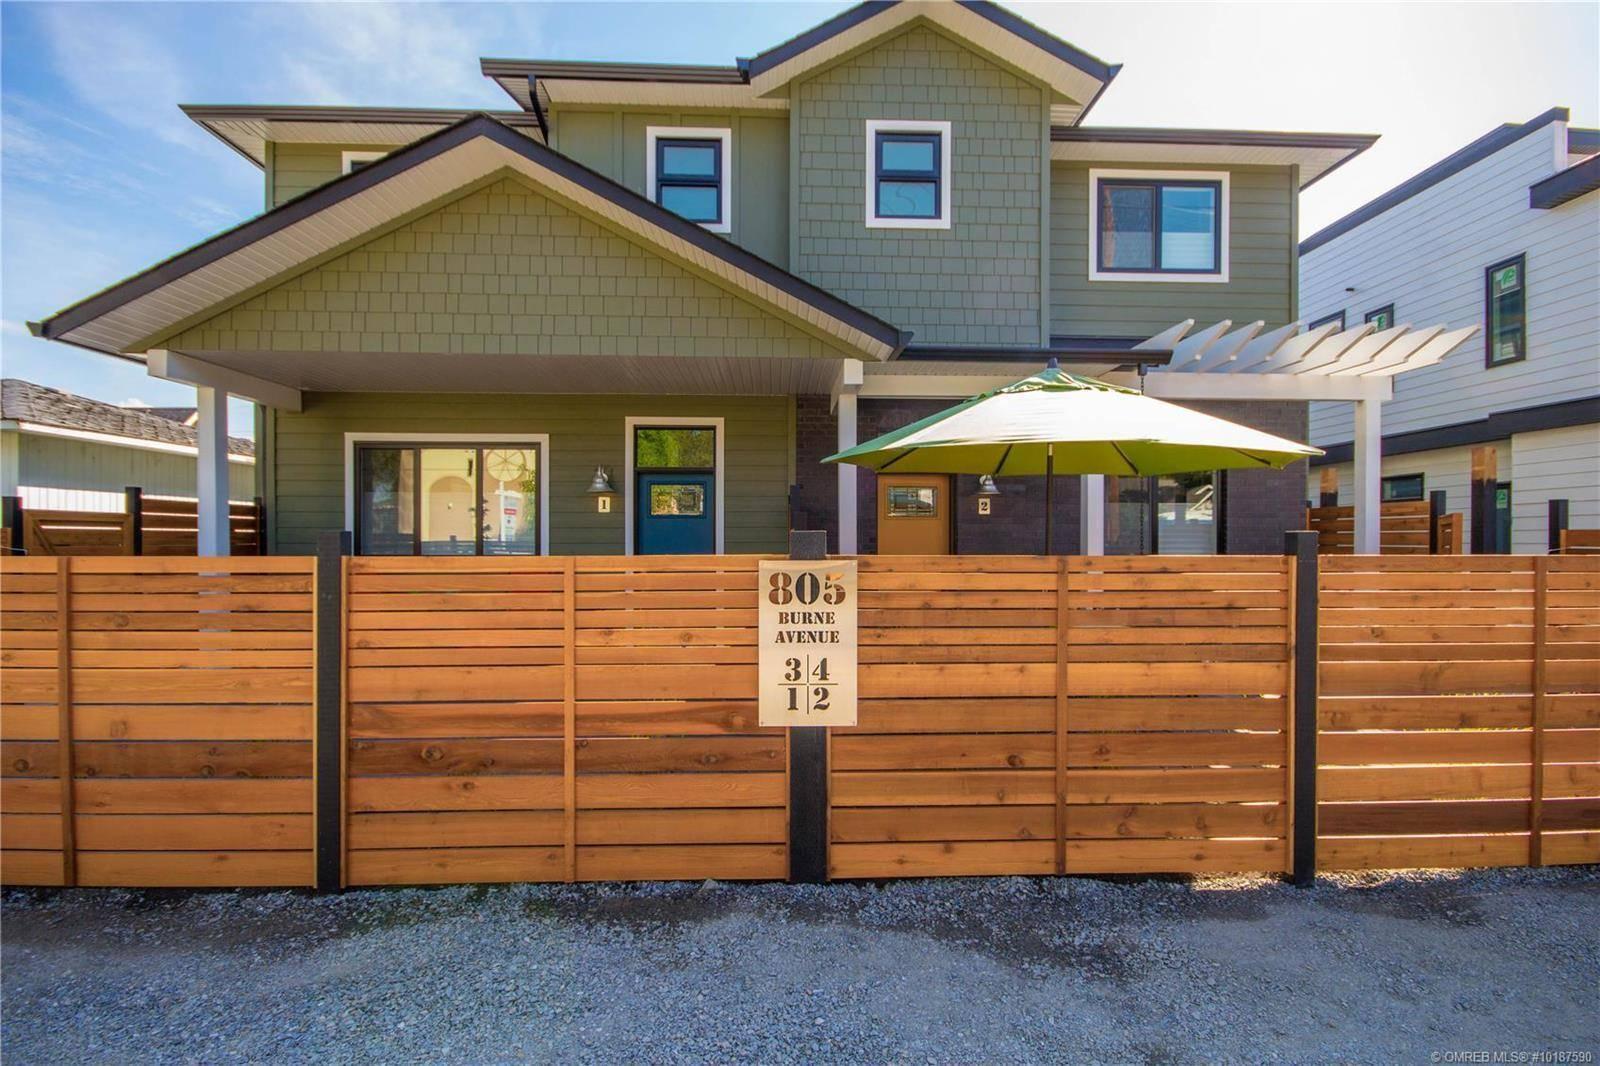 Townhouse for sale at 805 Burne Ave Unit 1 Kelowna British Columbia - MLS: 10187590